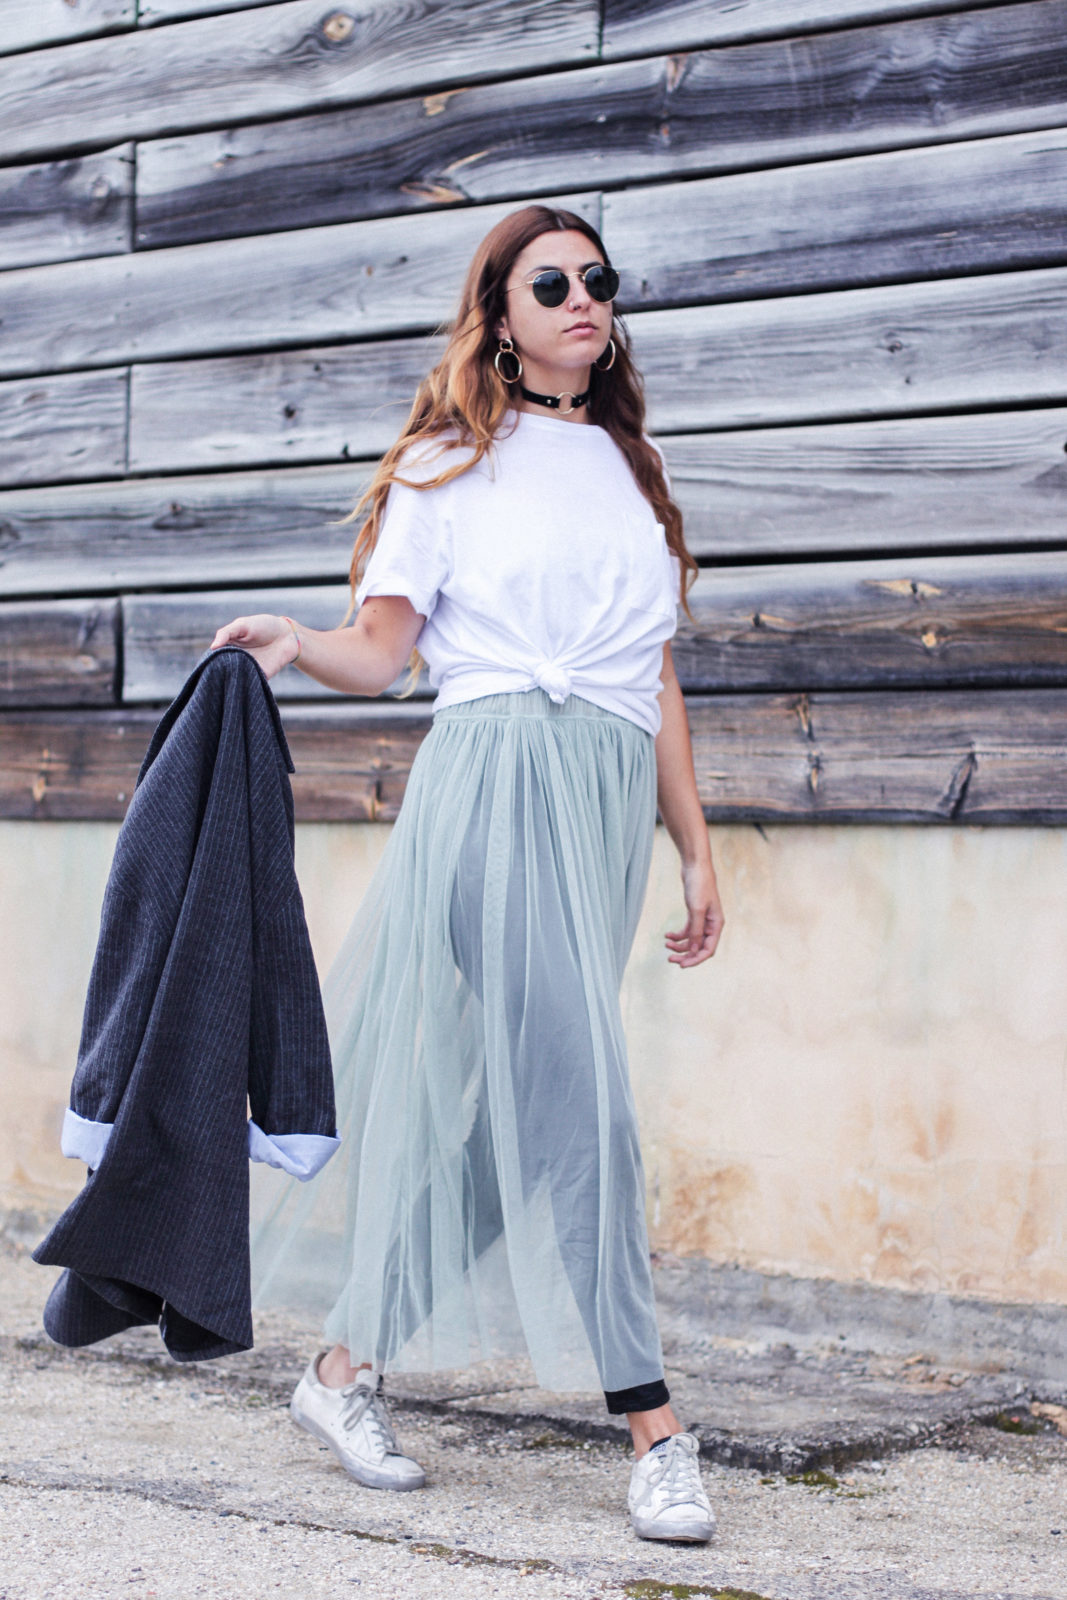 vestido_de_tul_sobre_pantalon_estilo_bailarina_blazer_oversize_pendientes_de_aros_choker_tendencias_trends_fall_2016_street_style_donkeycool-9